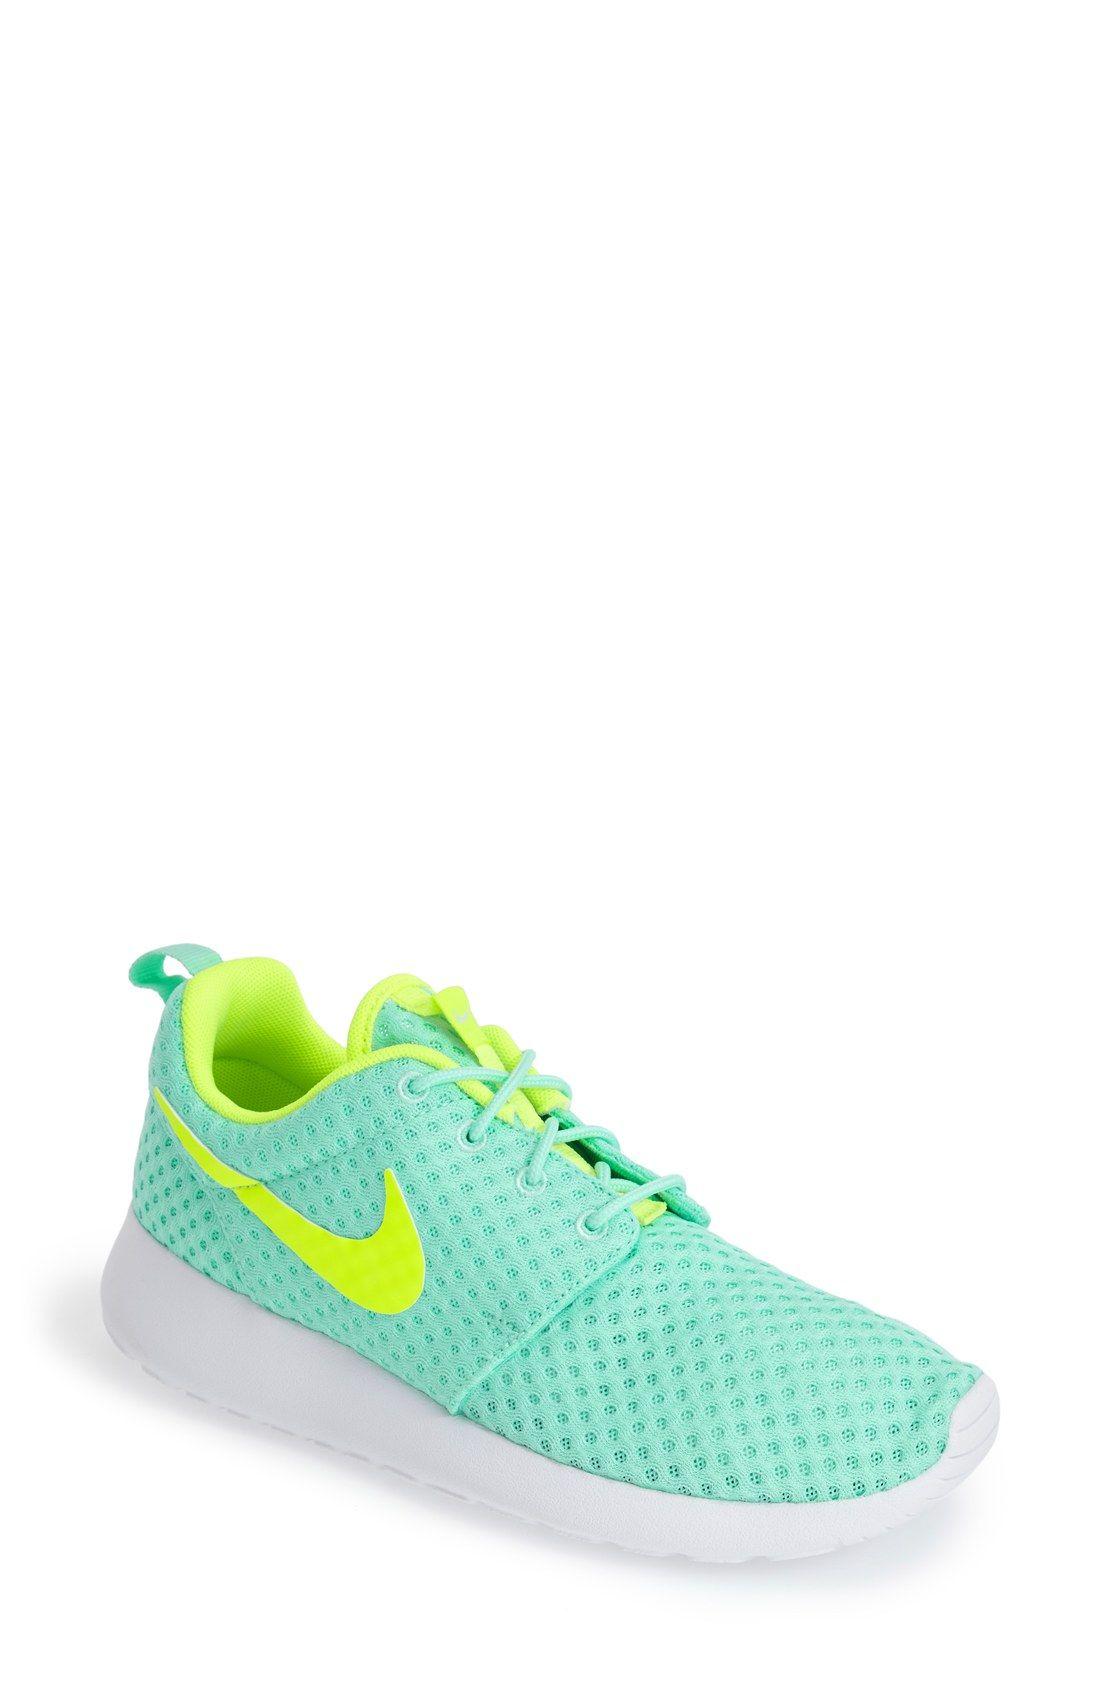 super popular 77a62 49675 ... reduced nike roshe run br flyknit sneaker women f88c9 95cd5